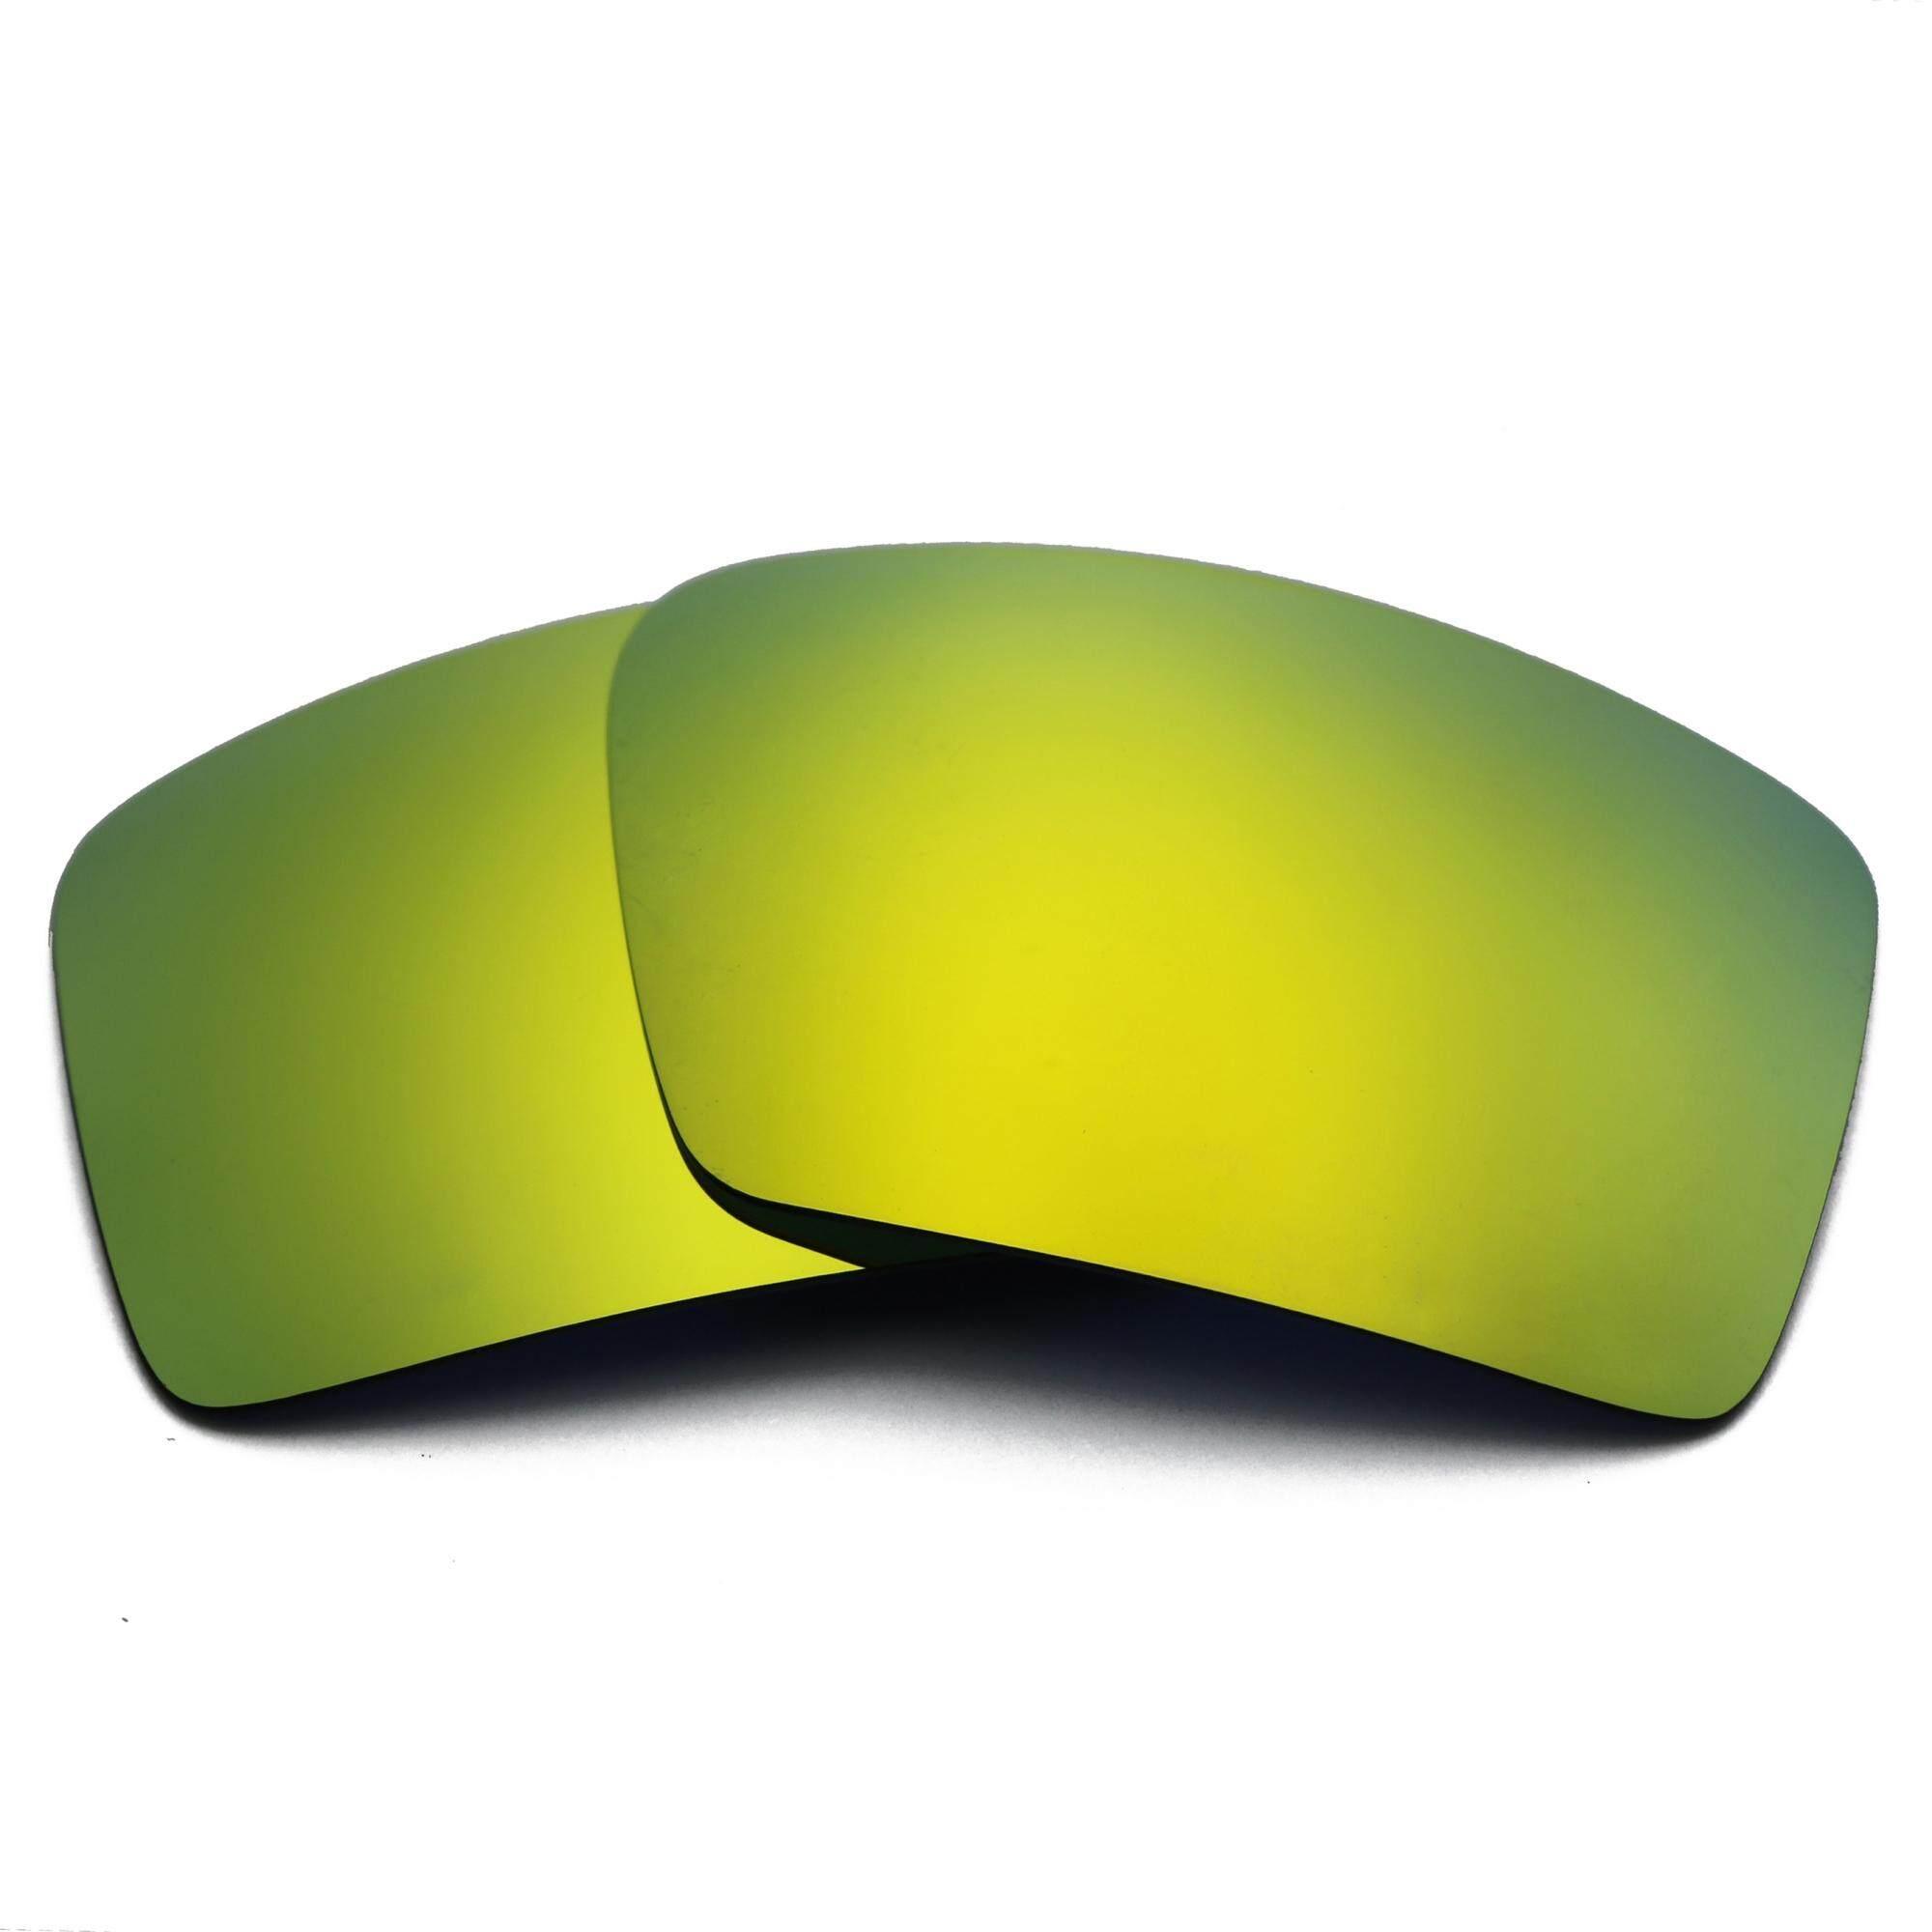 24 K Gold Cermin Lensa Pengganti untuk Kacamata Gascan Terpolarisasi Anti Air Asin Anti Debu-Intl